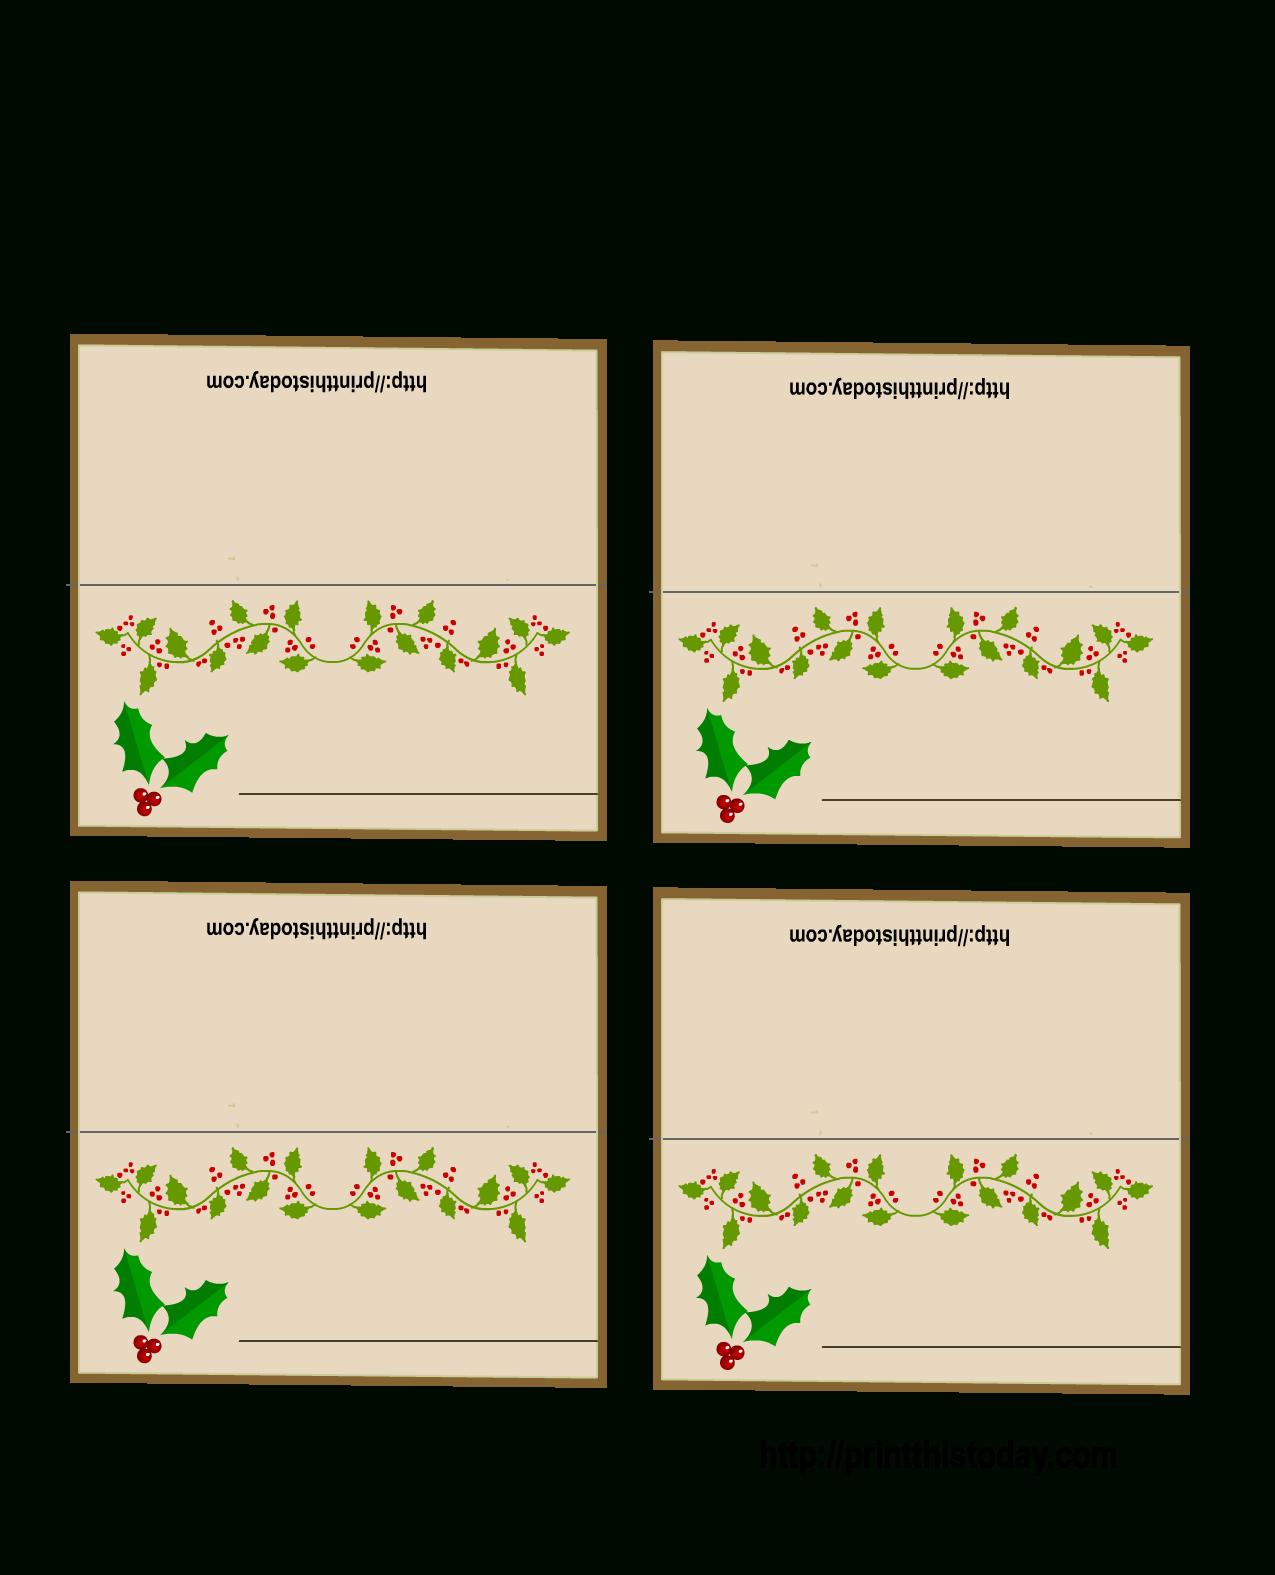 003 Table Name Cards Template Christmas Ideas Place For Christmas Table Place Cards Template